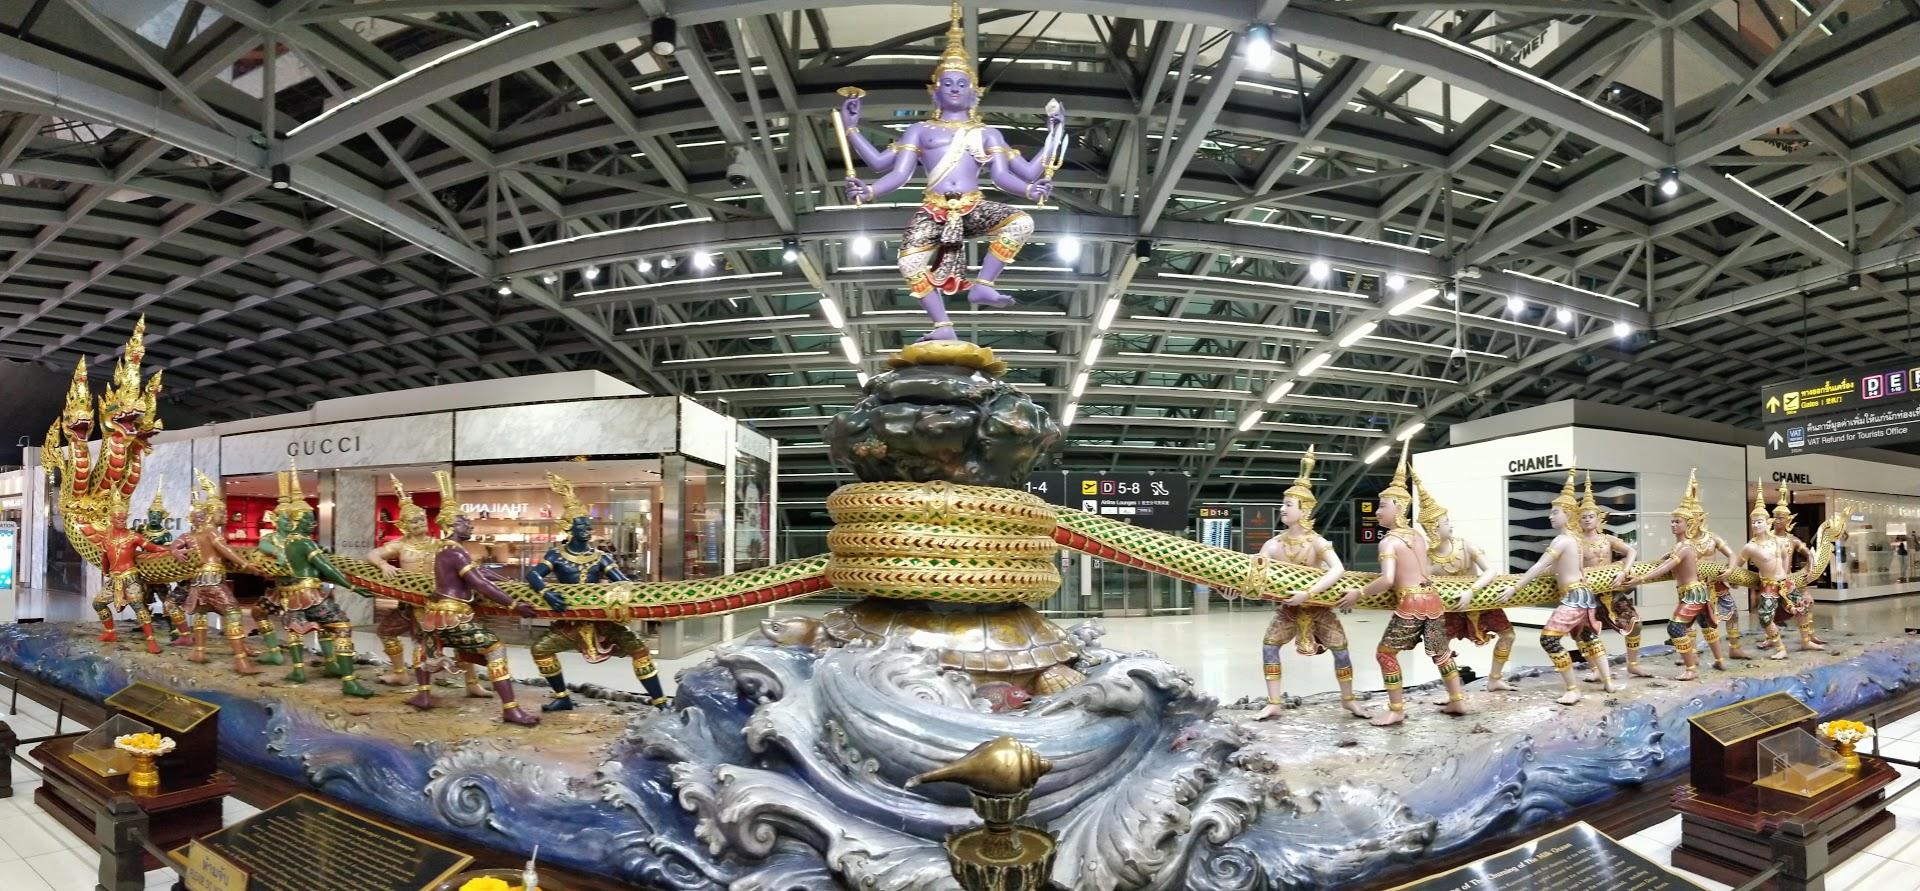 a_panoramic_picture_of_the_samudra_manthan_scene_taken_at_suvarnabhumi_airport_in_bangkok